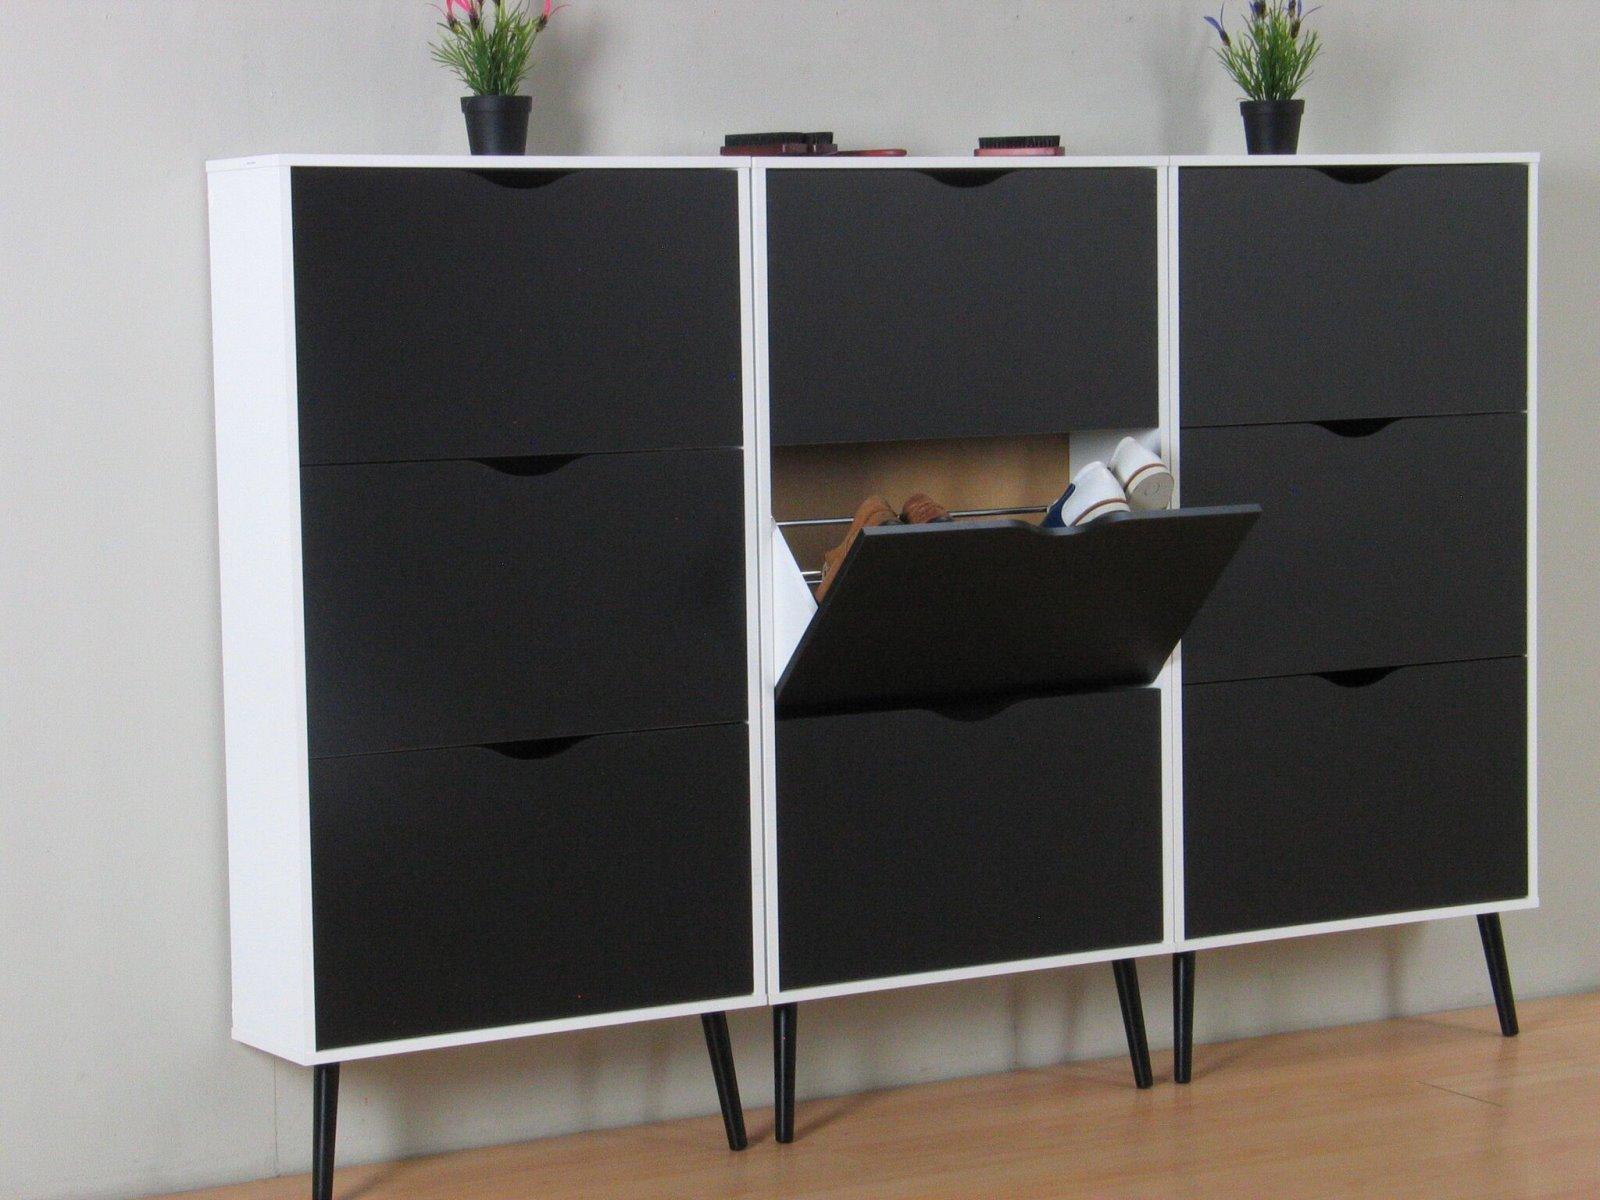 3x schuhschrank napoli schuhkipper schuhregal flur dielen. Black Bedroom Furniture Sets. Home Design Ideas